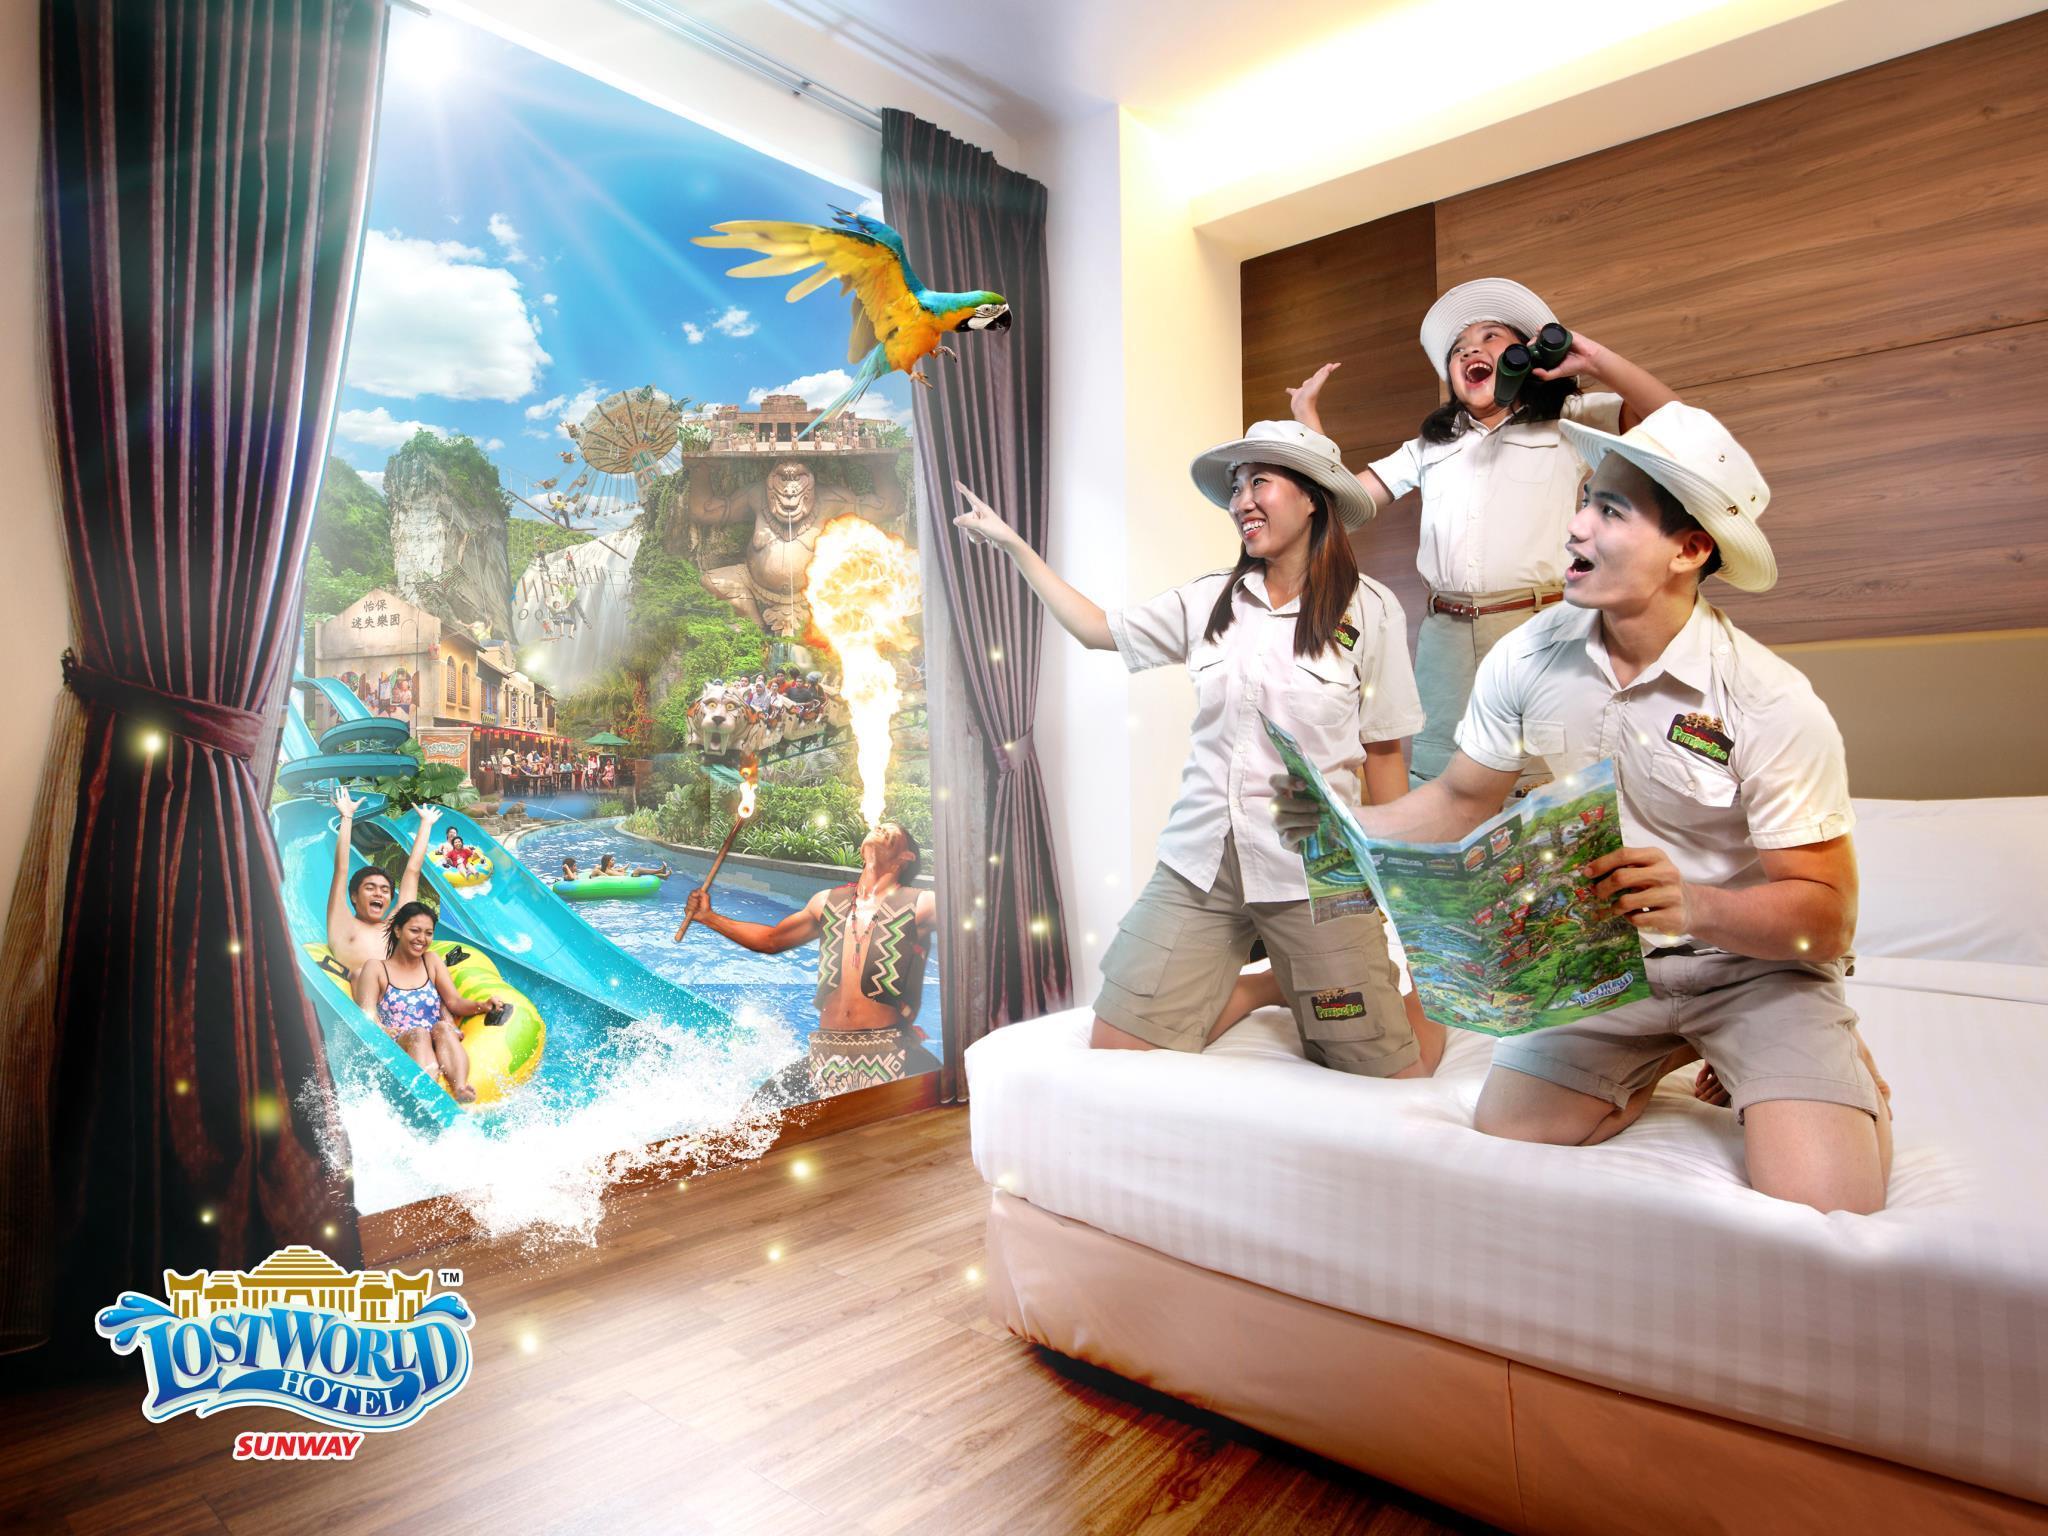 Sunway Lost World Hotel